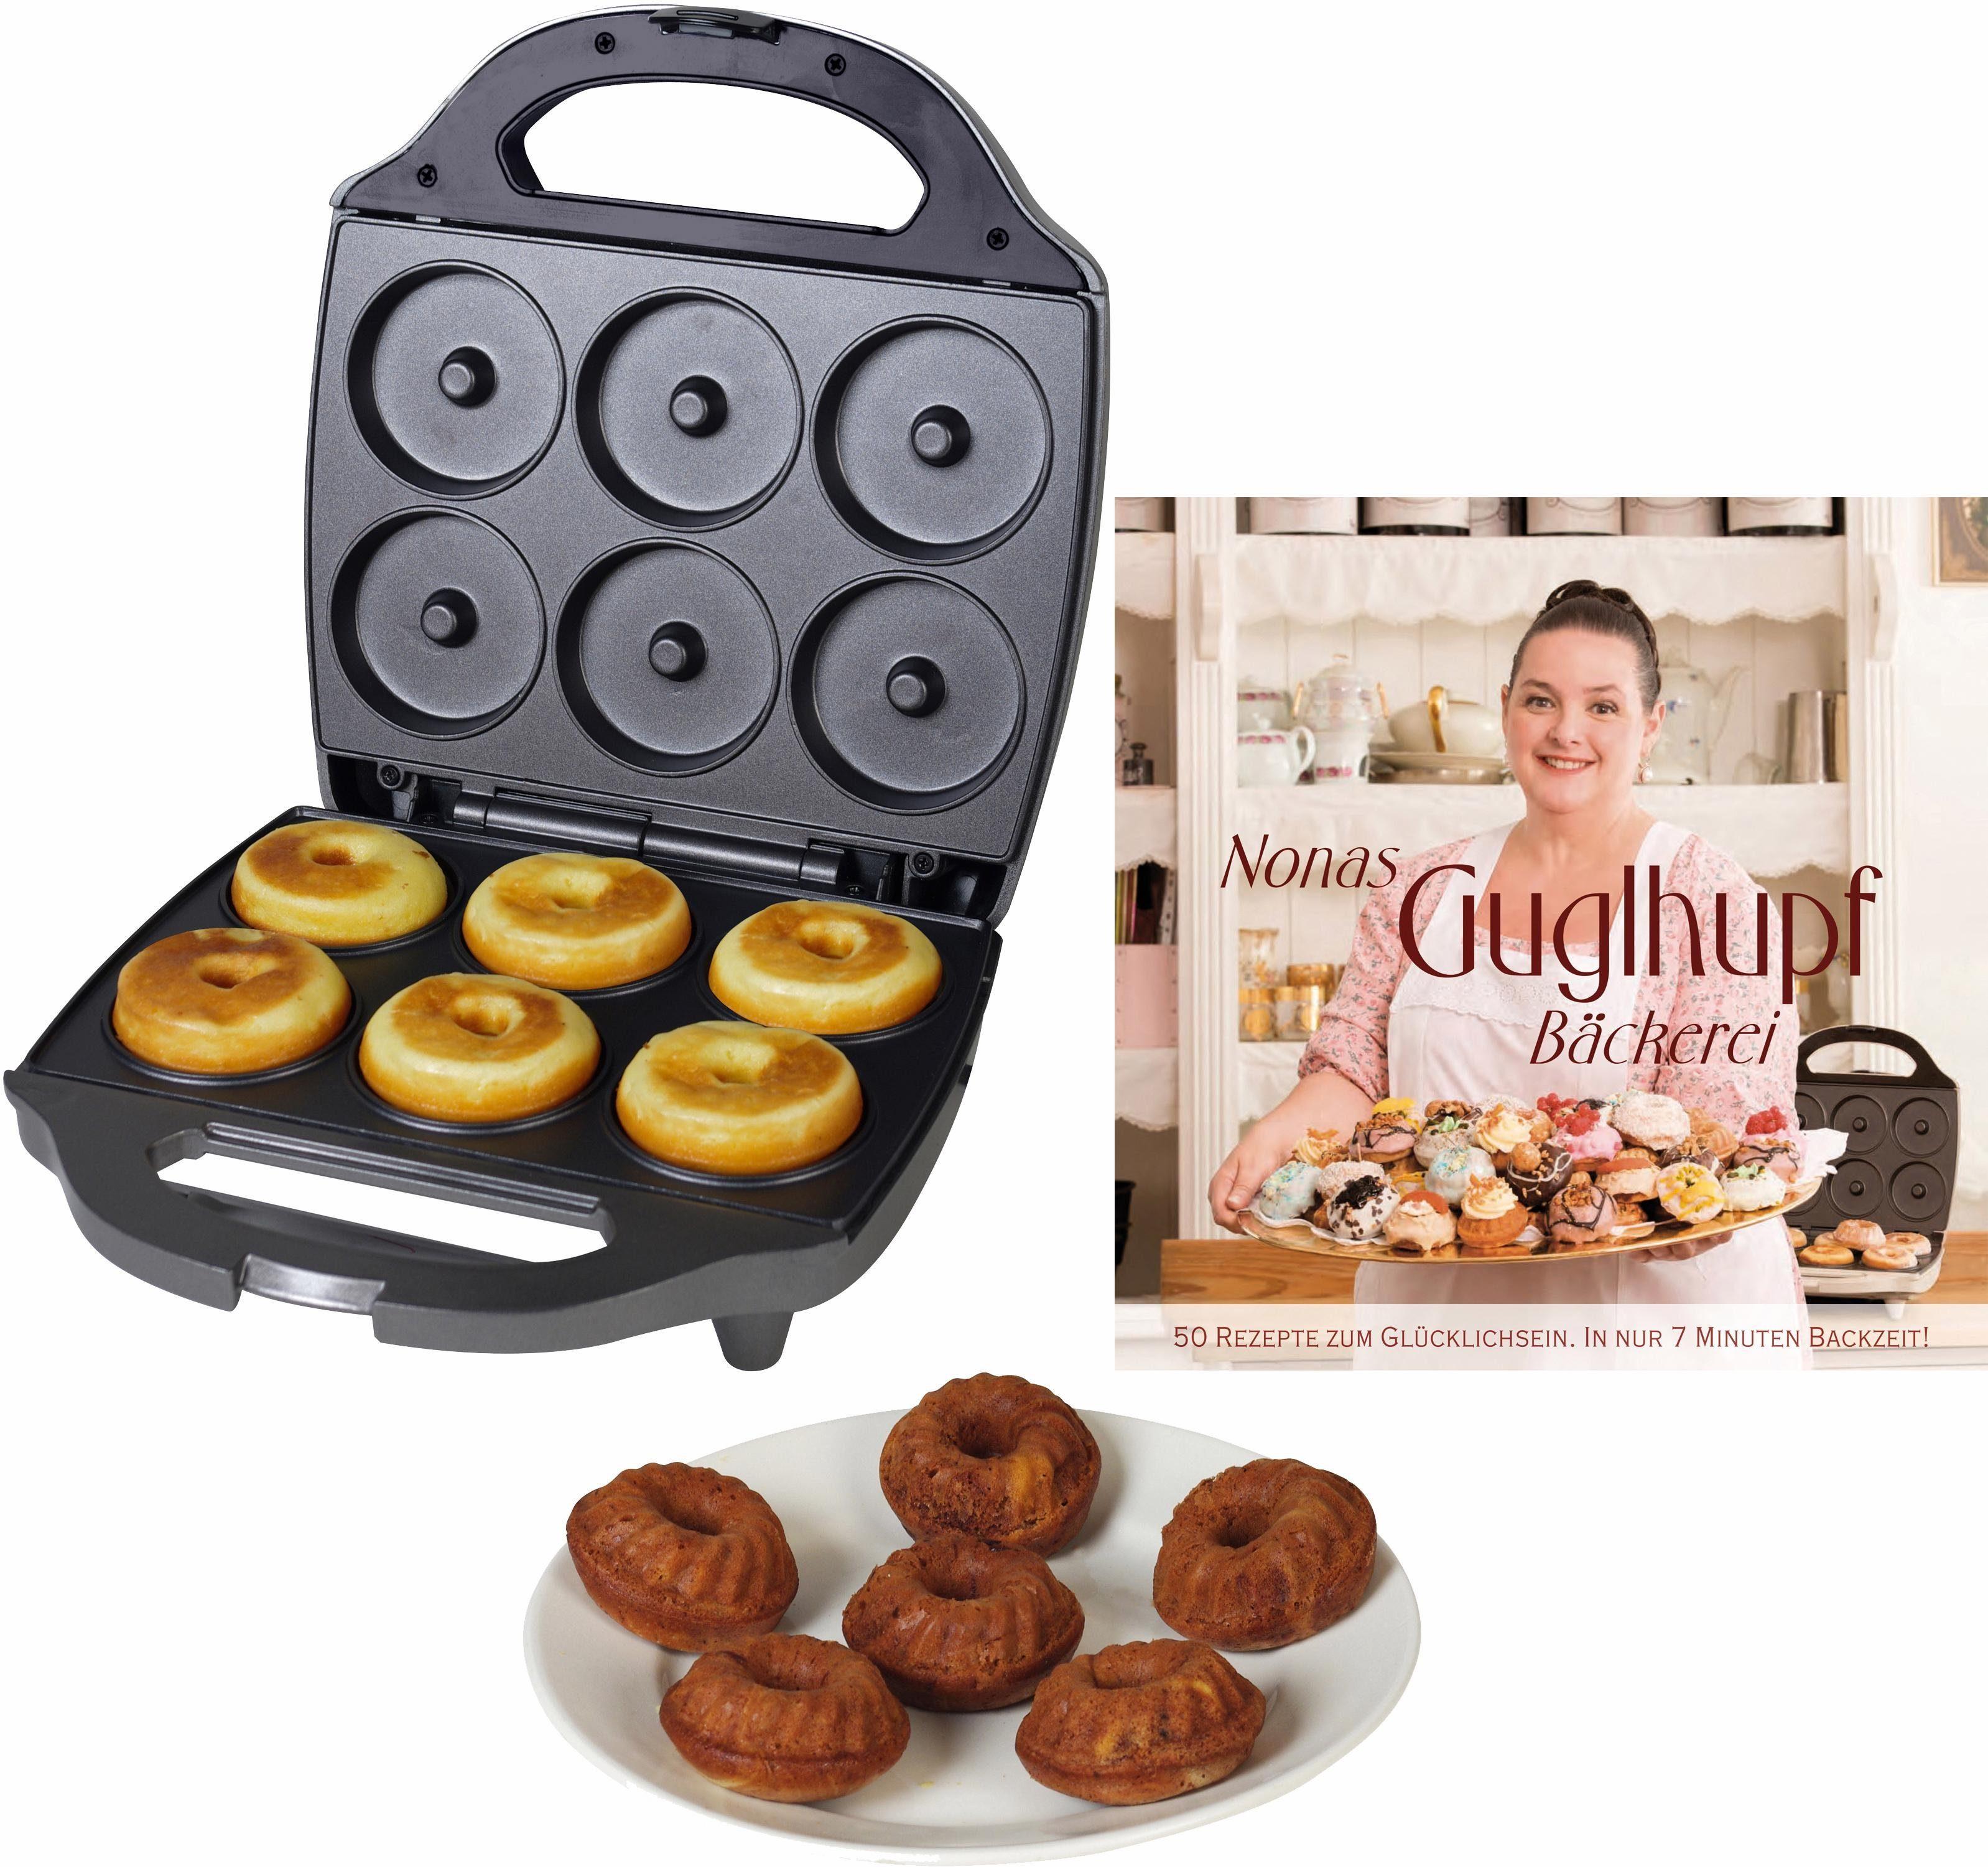 Kalorik Waffeleisen Cupcake Maker TKG CKM 1002 NYC RB, 900 Watt, inkl. Backbuch mit 50 Rezepten